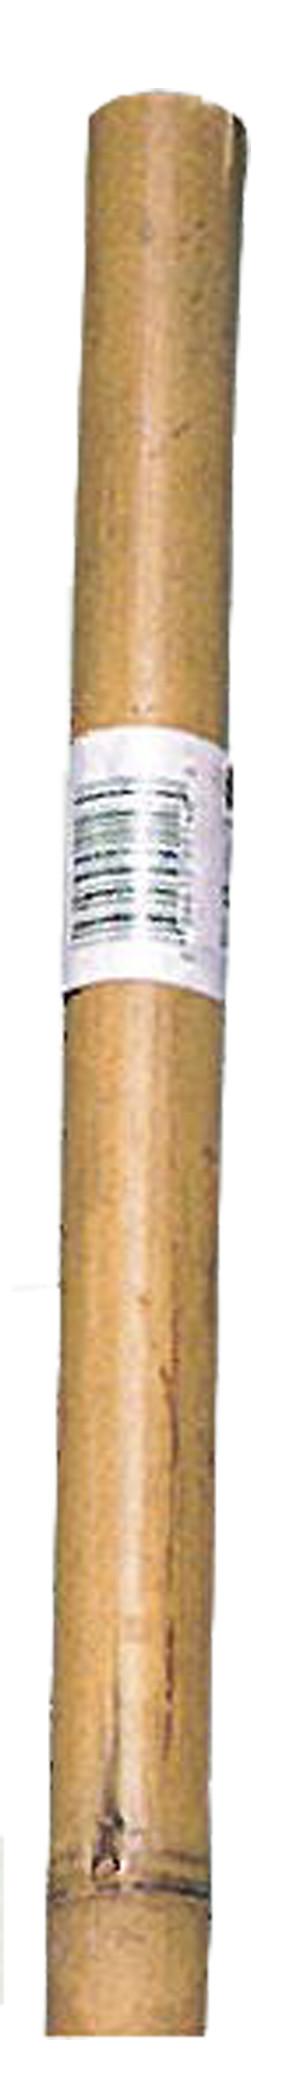 Bond Super Bamboo Pole Brown 10ea/1.25Inx6 ft